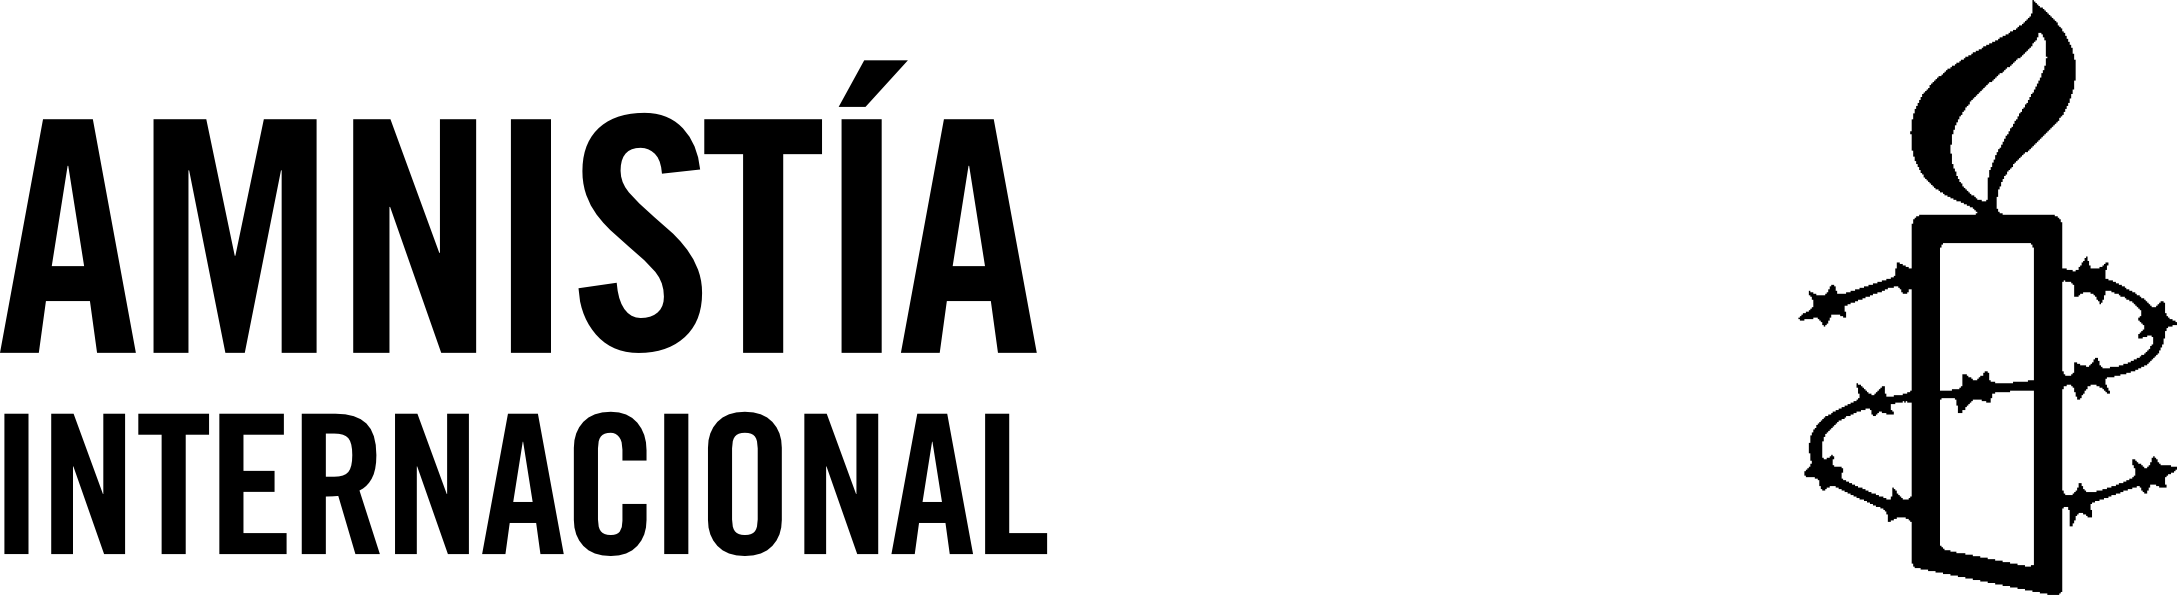 Logo AMNISTIA INTERNACIONAL _bn.png